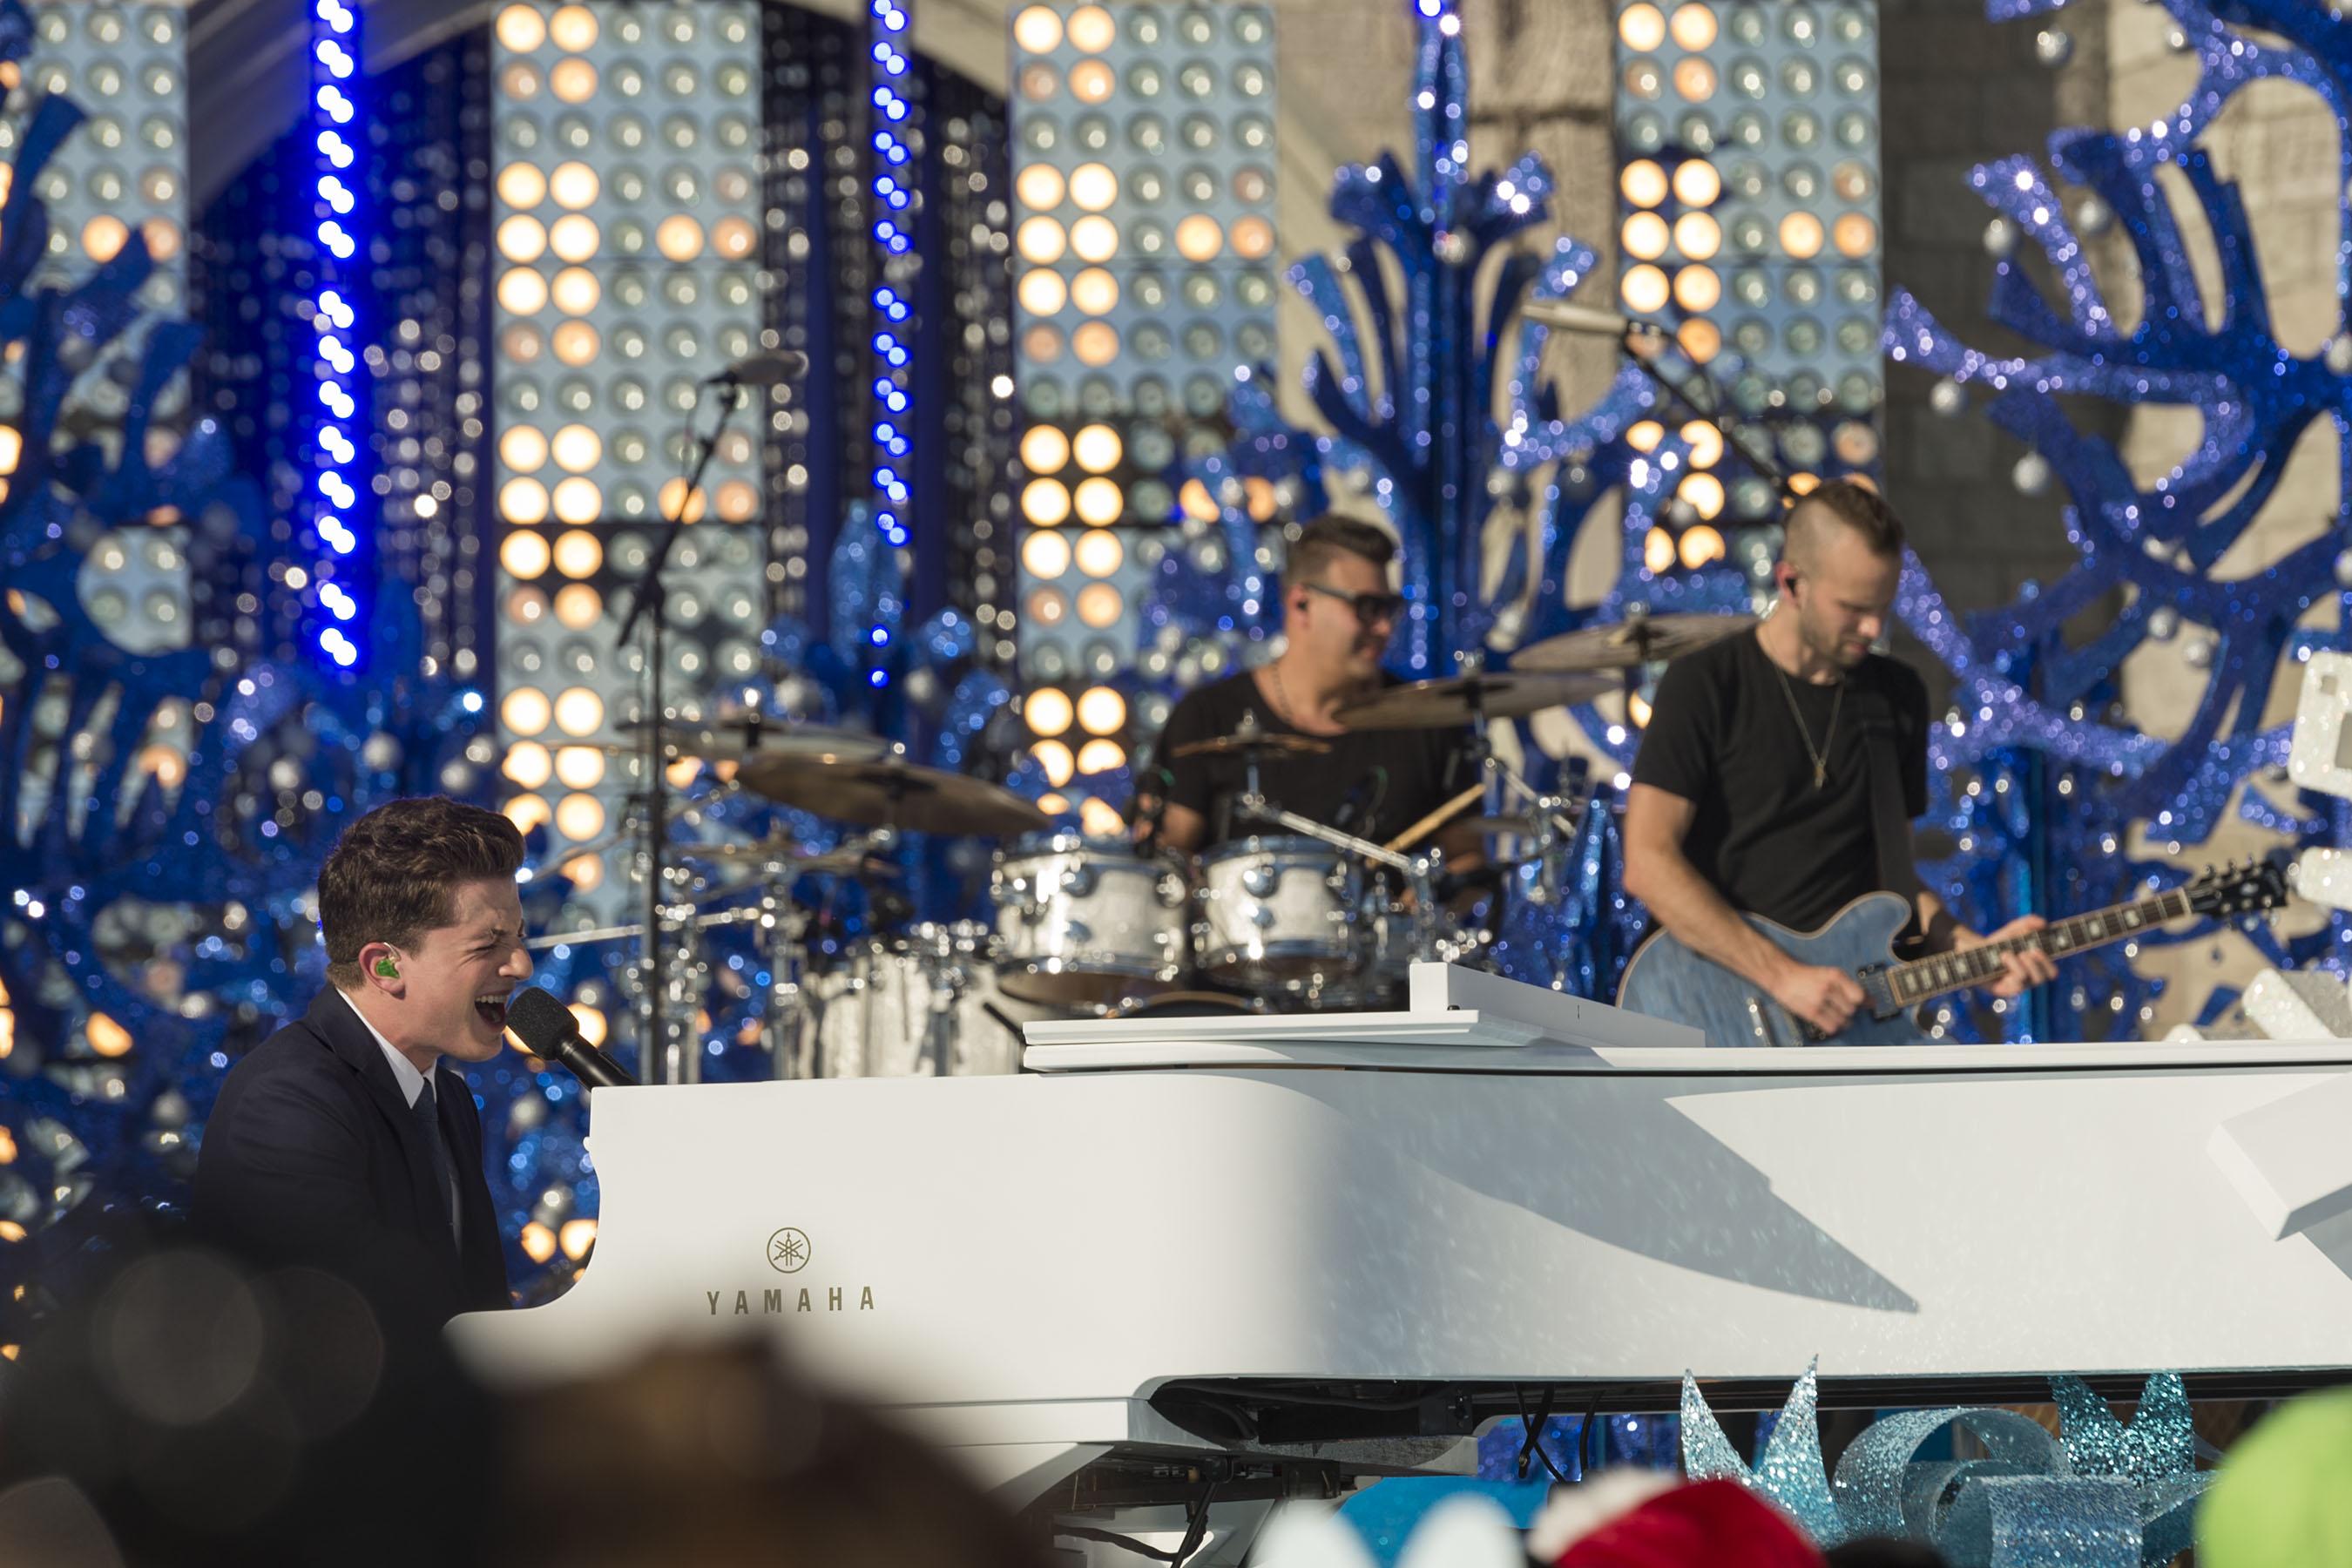 Disney Parks Unforgettable Christmas Celebration performance - Charlie Puth